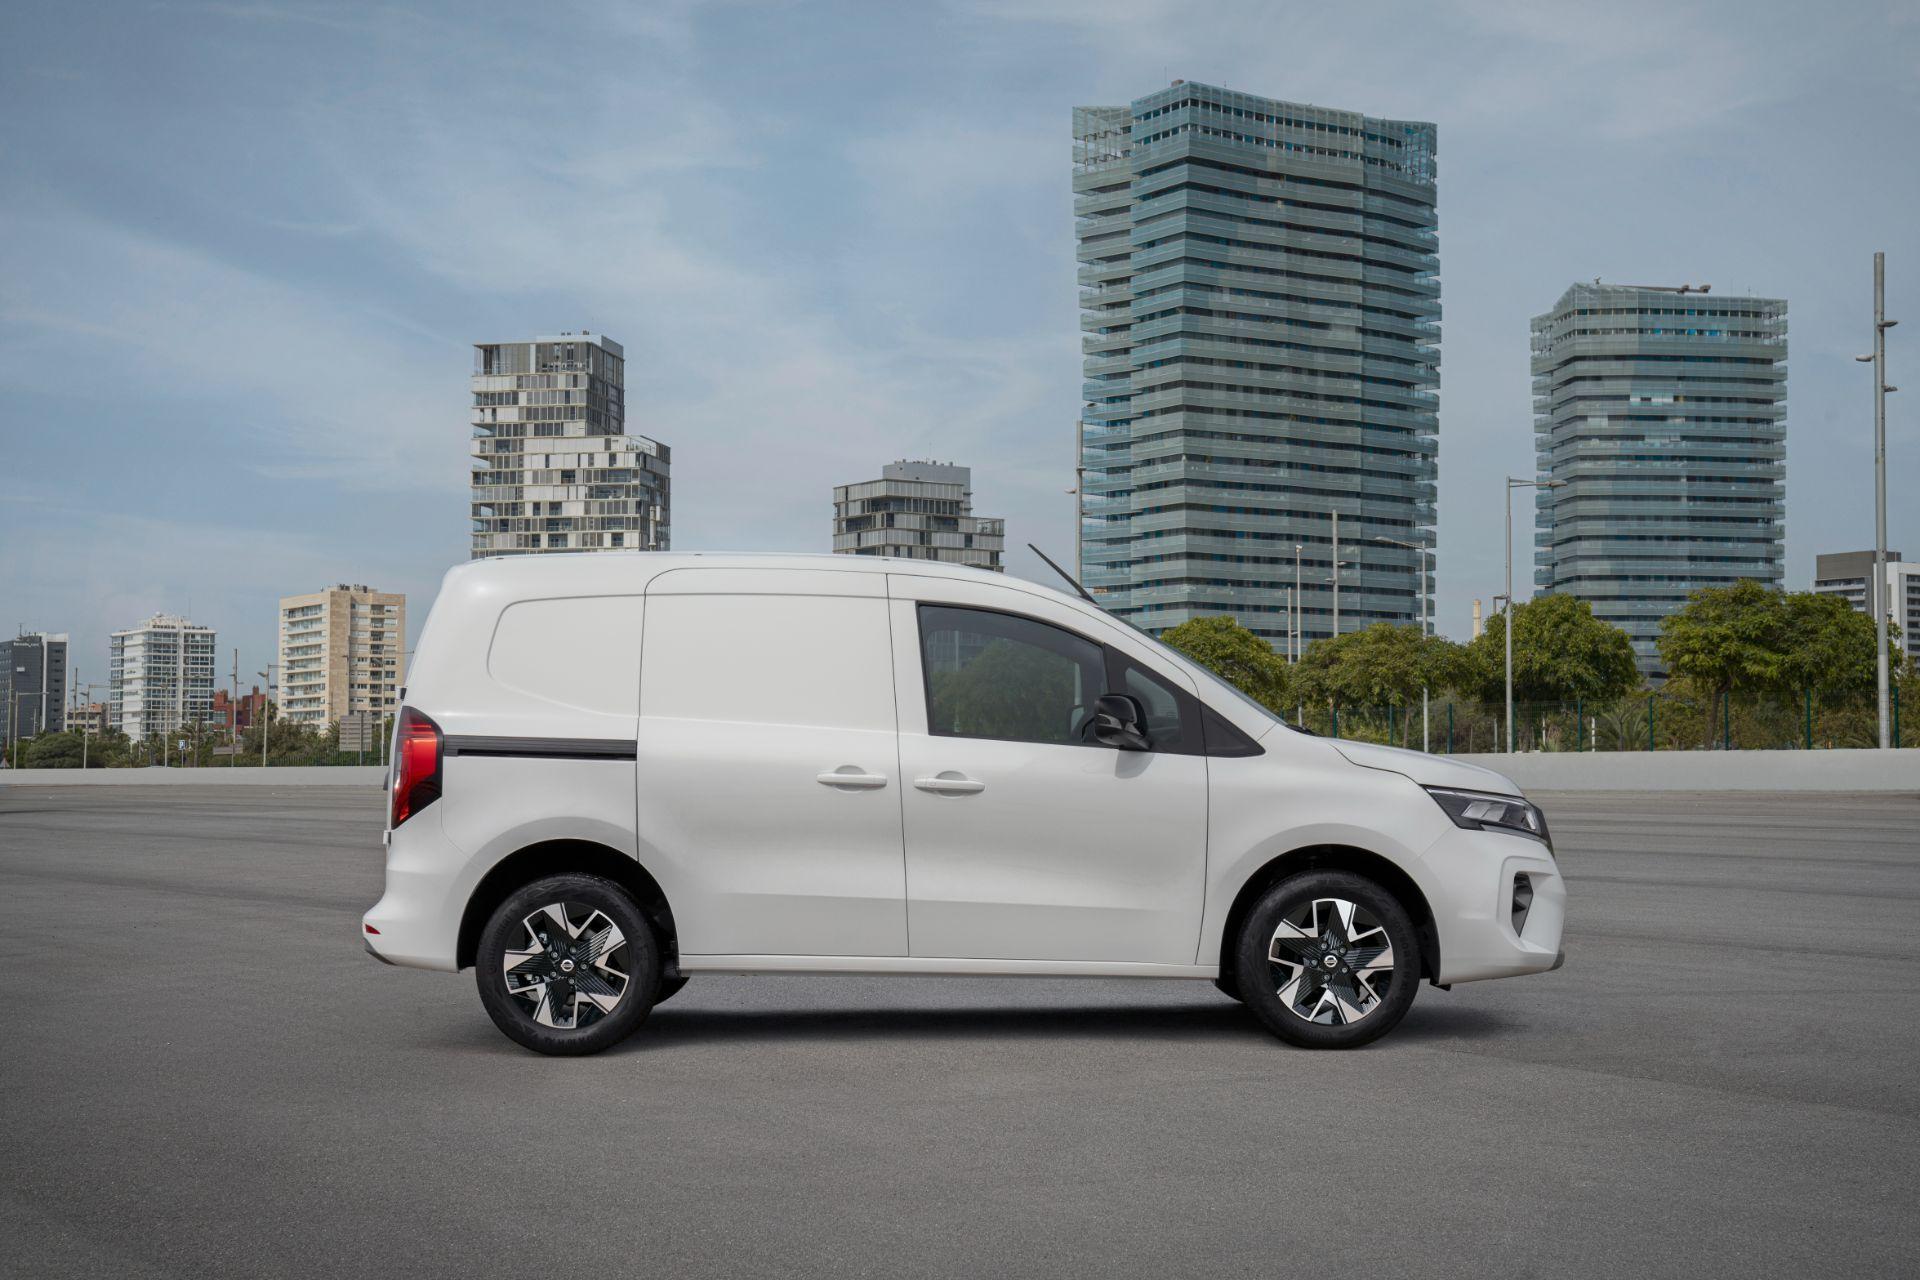 2022-Nissan-Townstar-EV-van-dynamic-6-1